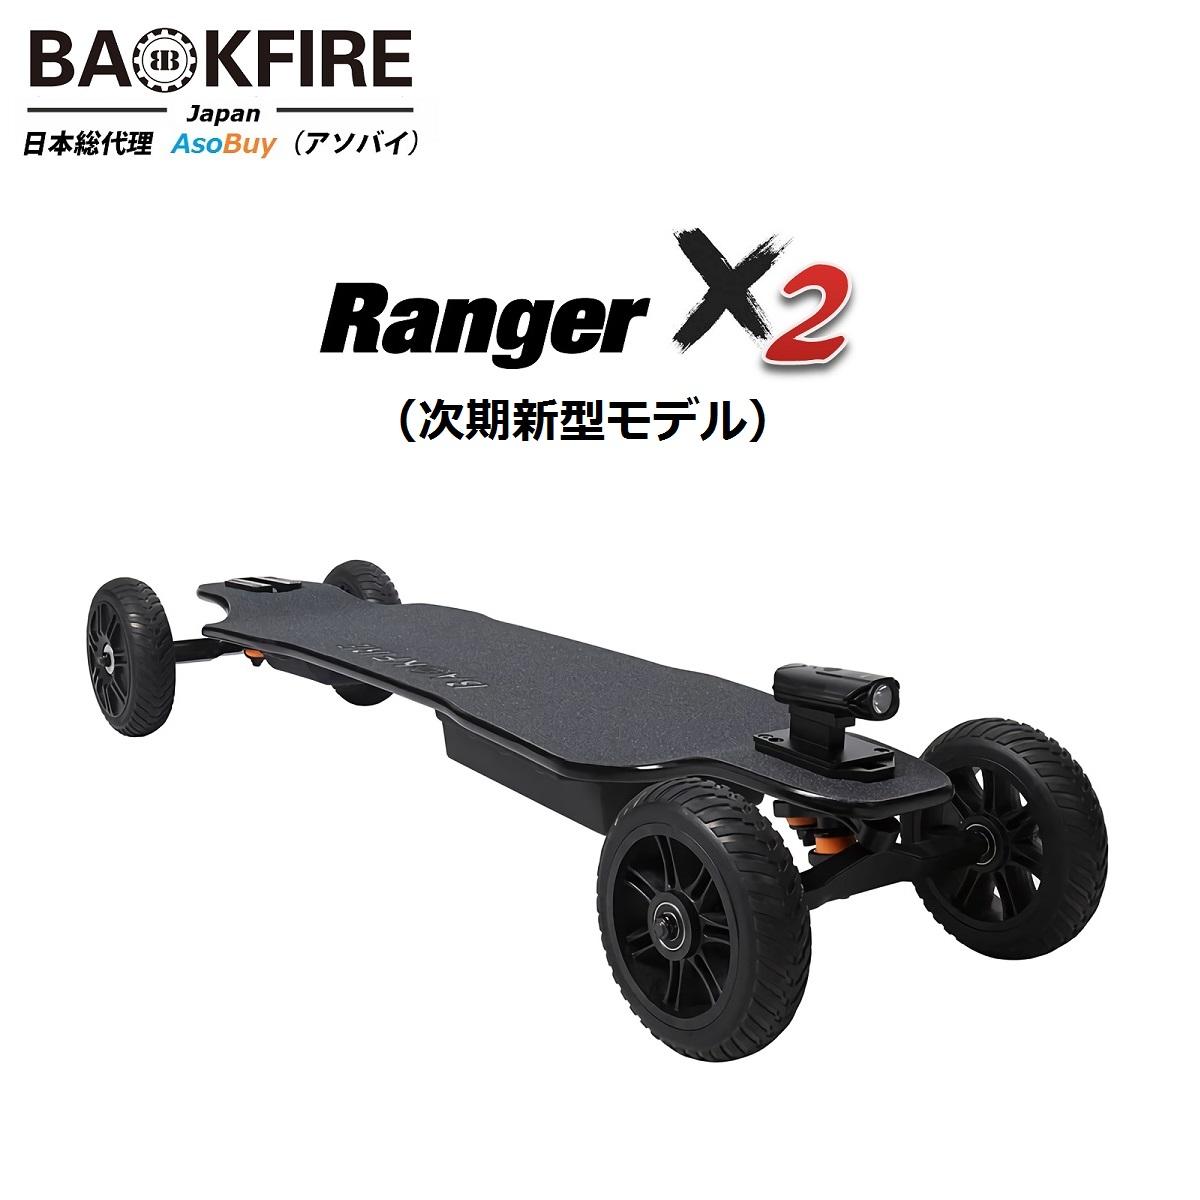 Backfire Ranger X2 全地形対応 モンスター級 【数量限定緊急値下げ:139800→119800】【第2世代・オフロード】Backfire Ranger X2 (バックファイヤー レンジャー X2) 全地形対応 1200Wx2超高出力モーター搭載 モンスター級 電動スケートボード